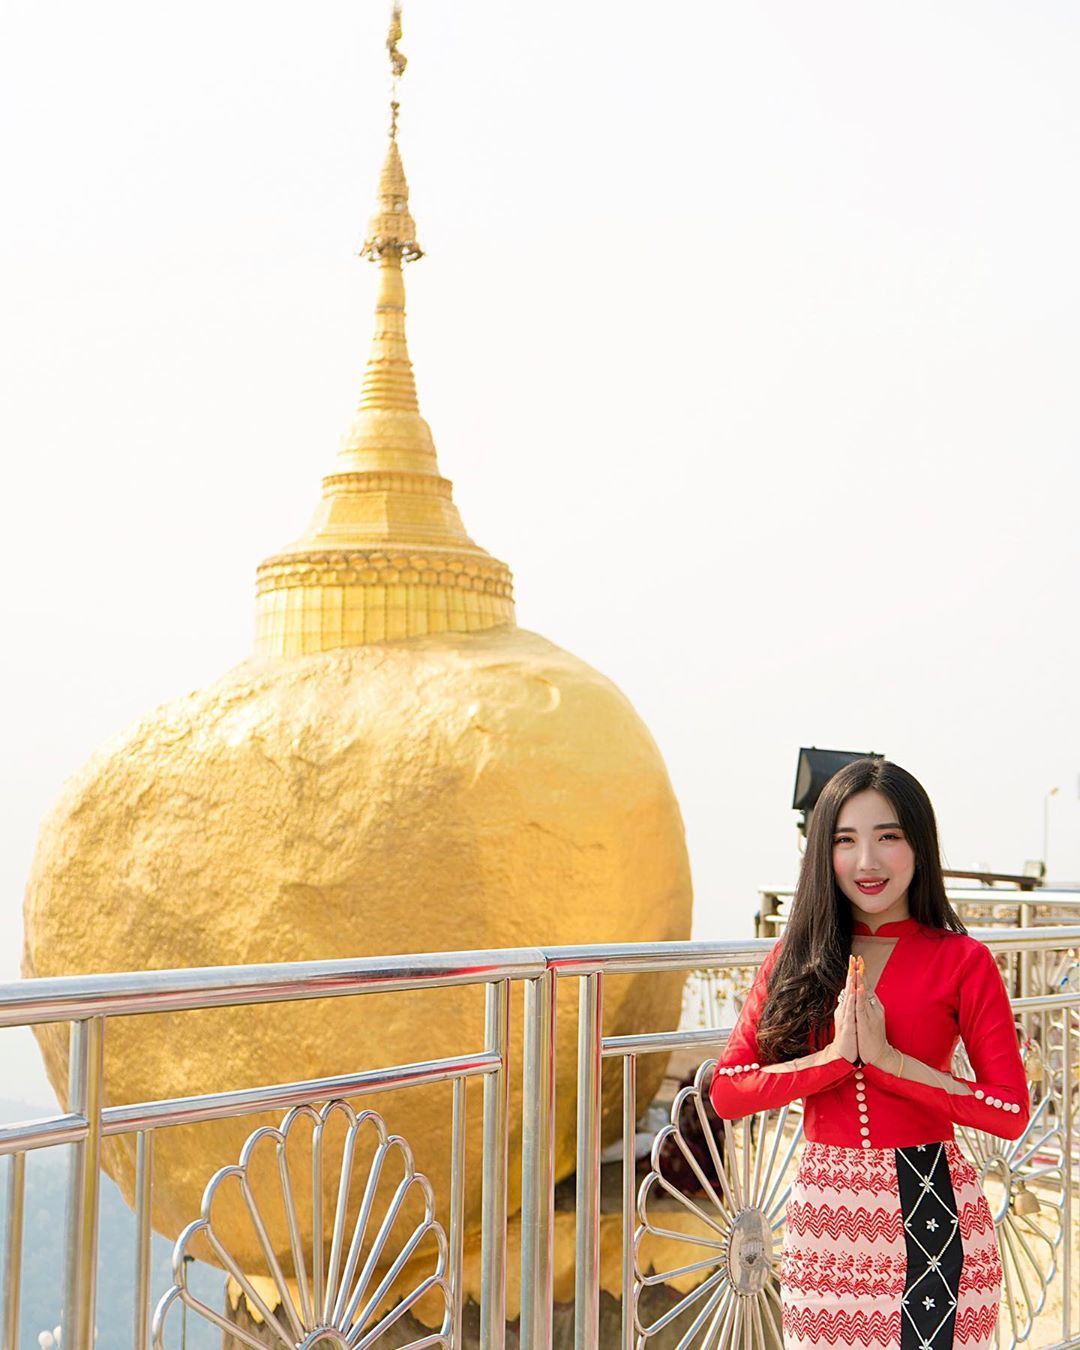 Hsu Eaint San, place of worship, architecture, building